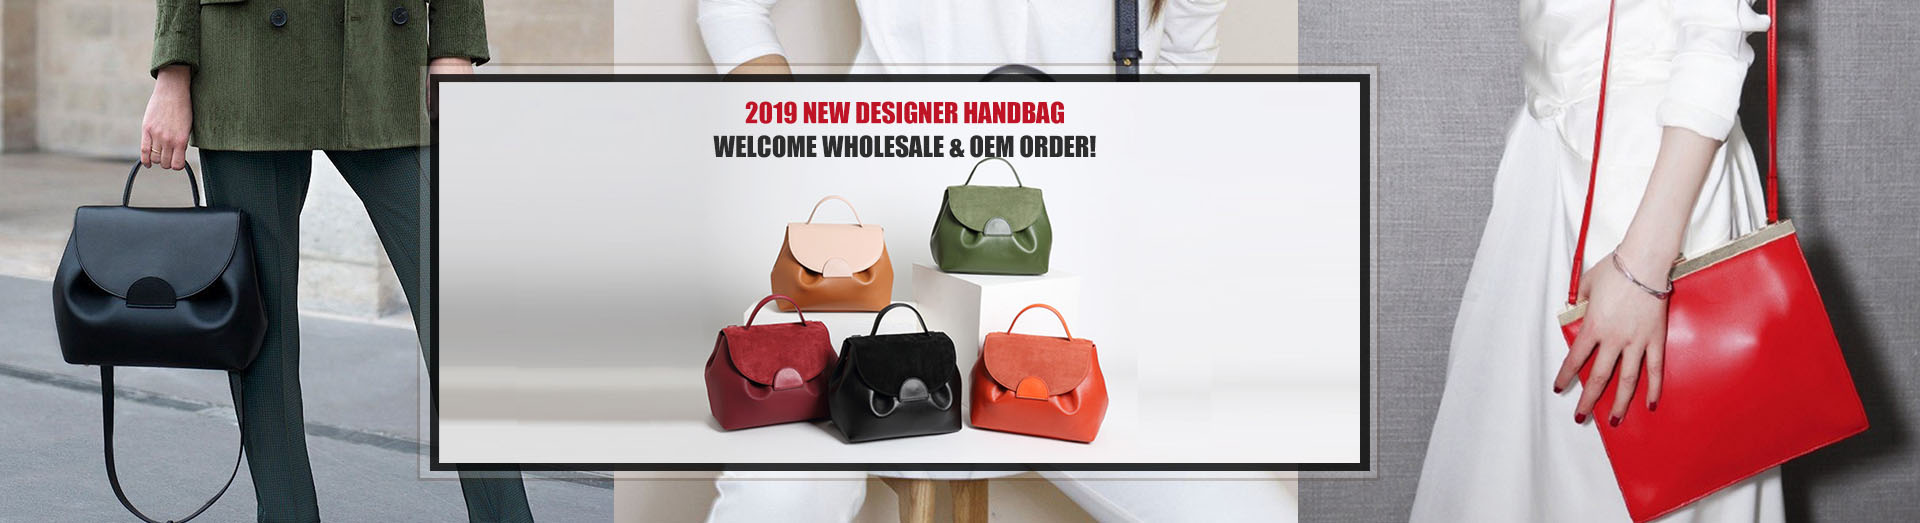 handbags cases